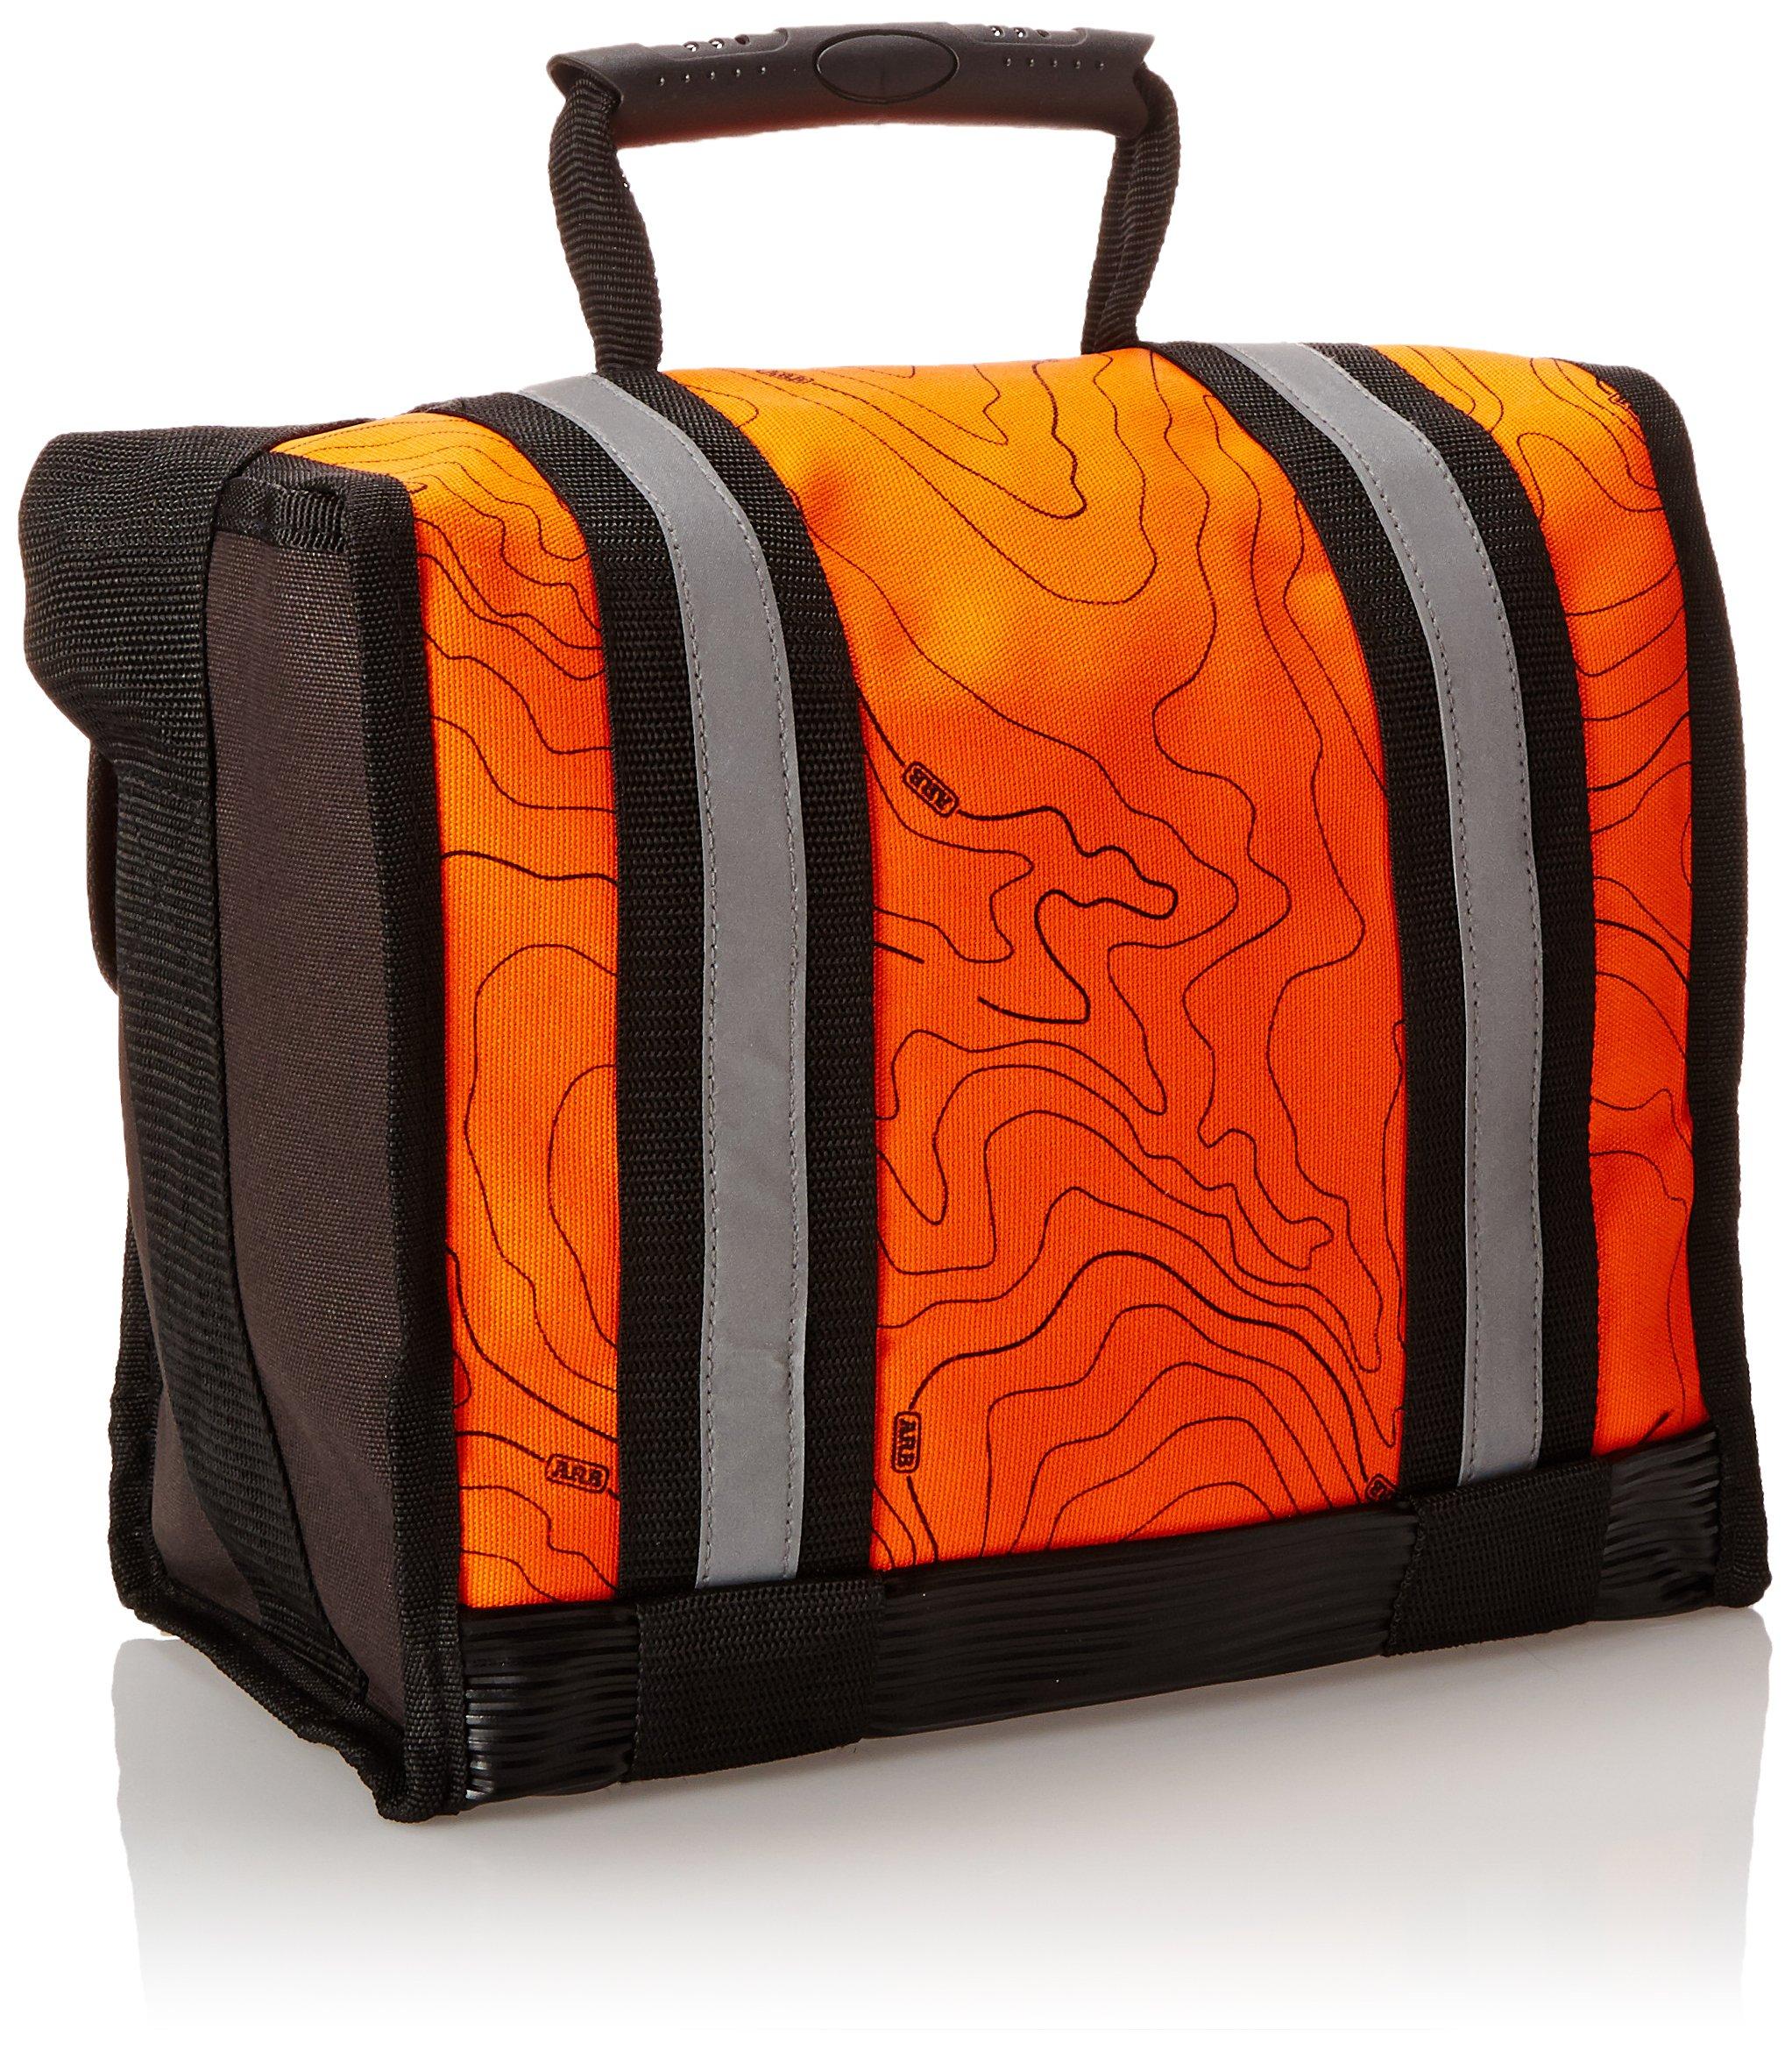 ARB ARB502 Orange Small Recovery Bag by ARB (Image #1)